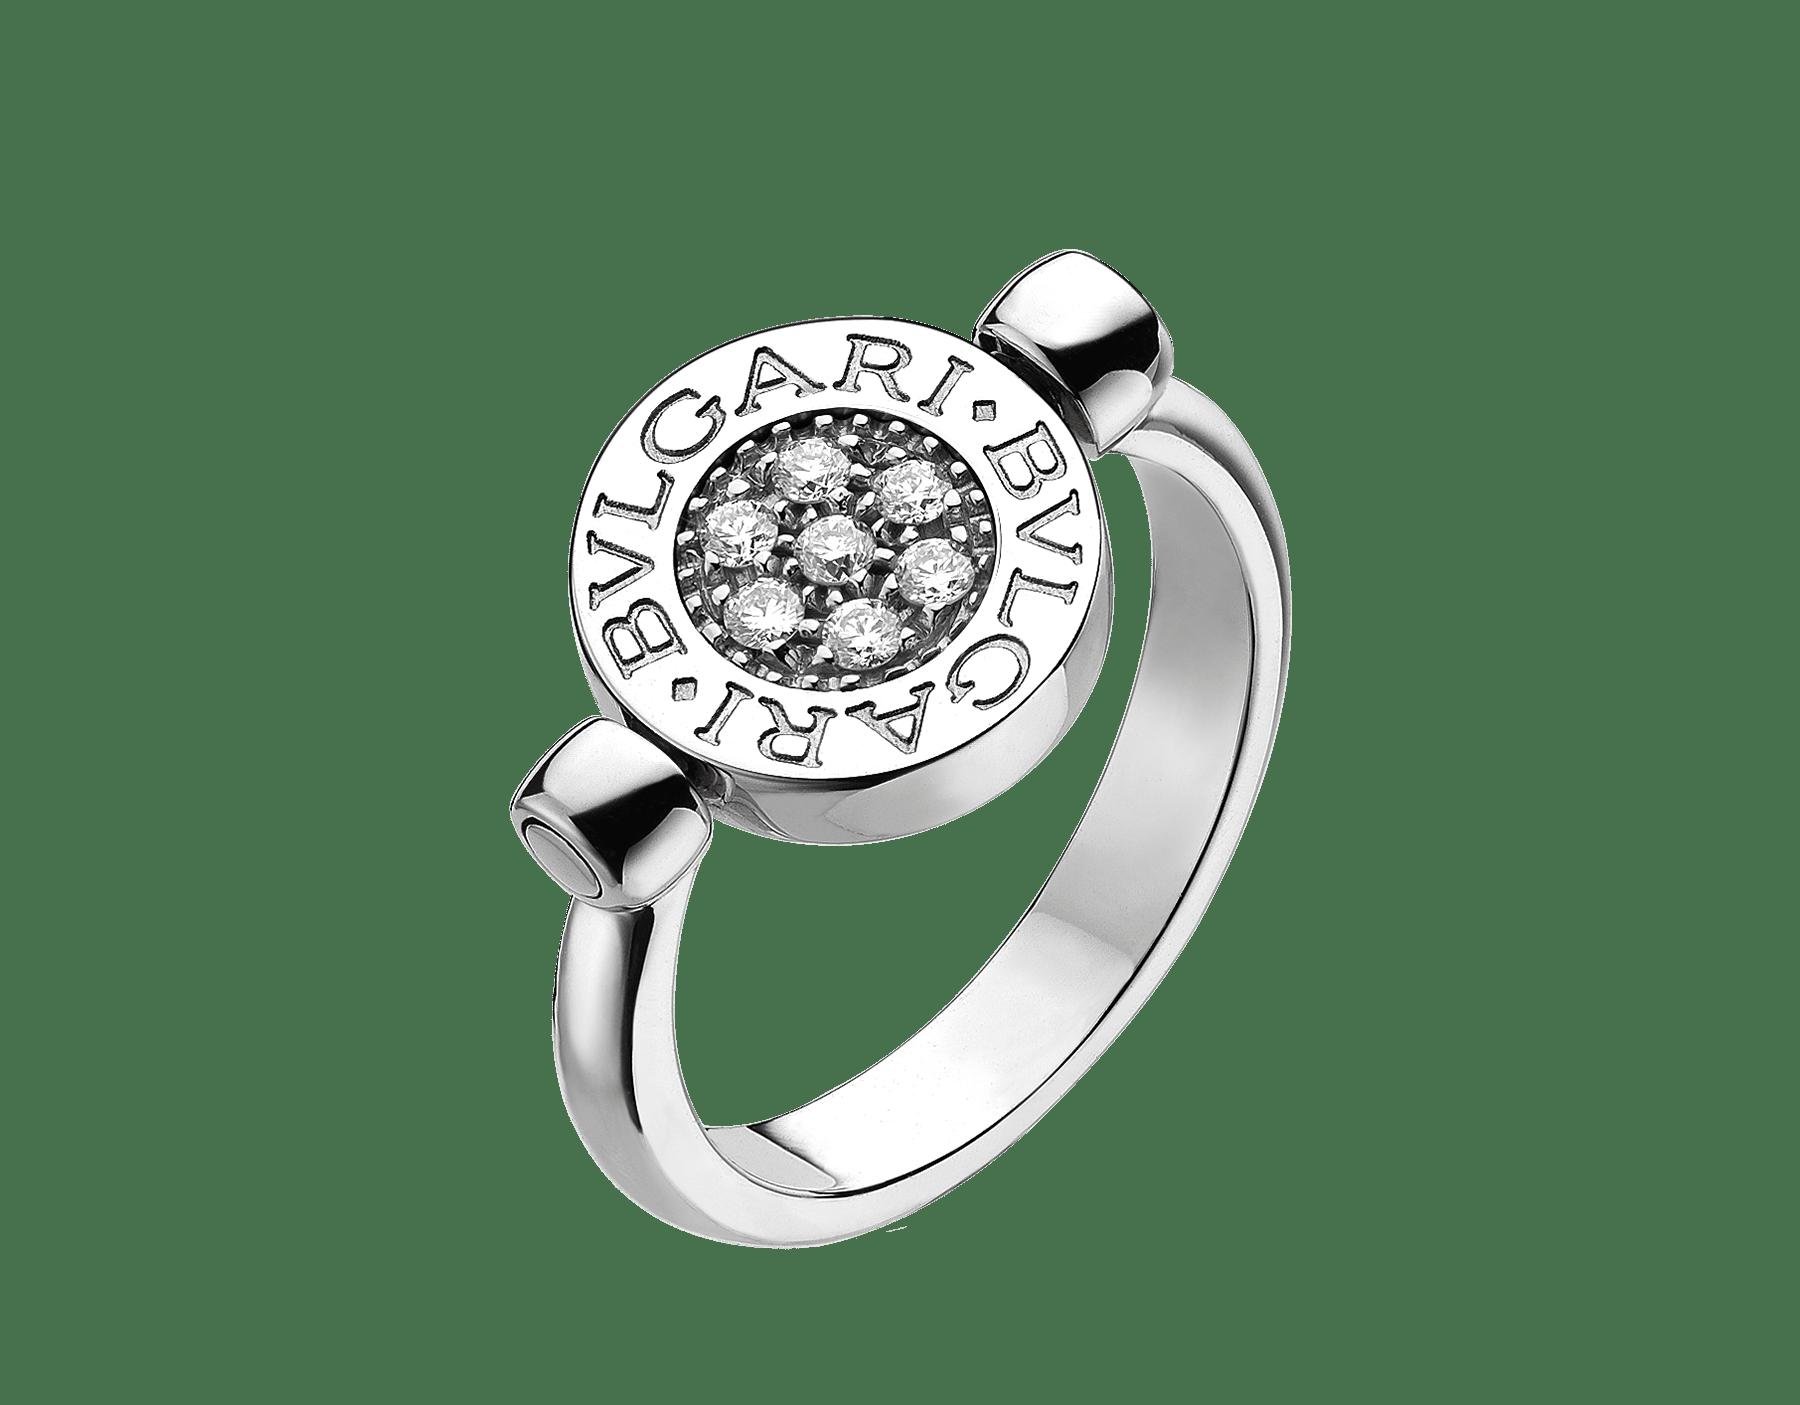 BVLGARI BVLGARI 18 kt white gold flip ring set with black onyx and pavé diamonds AN850723 image 1